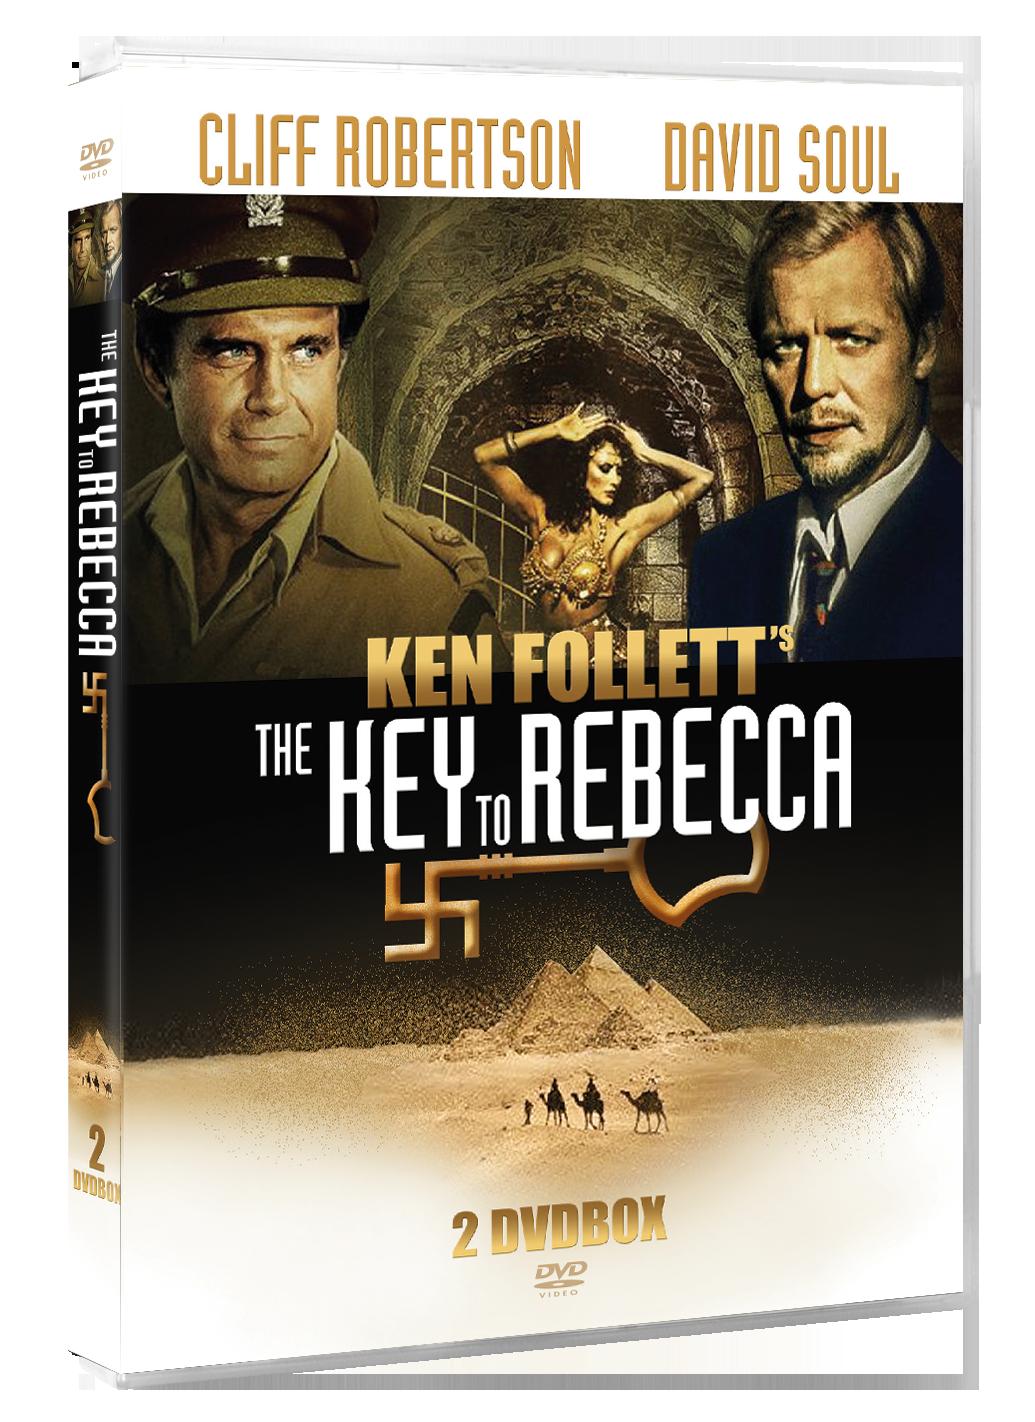 The Key to Rebecca - DVD